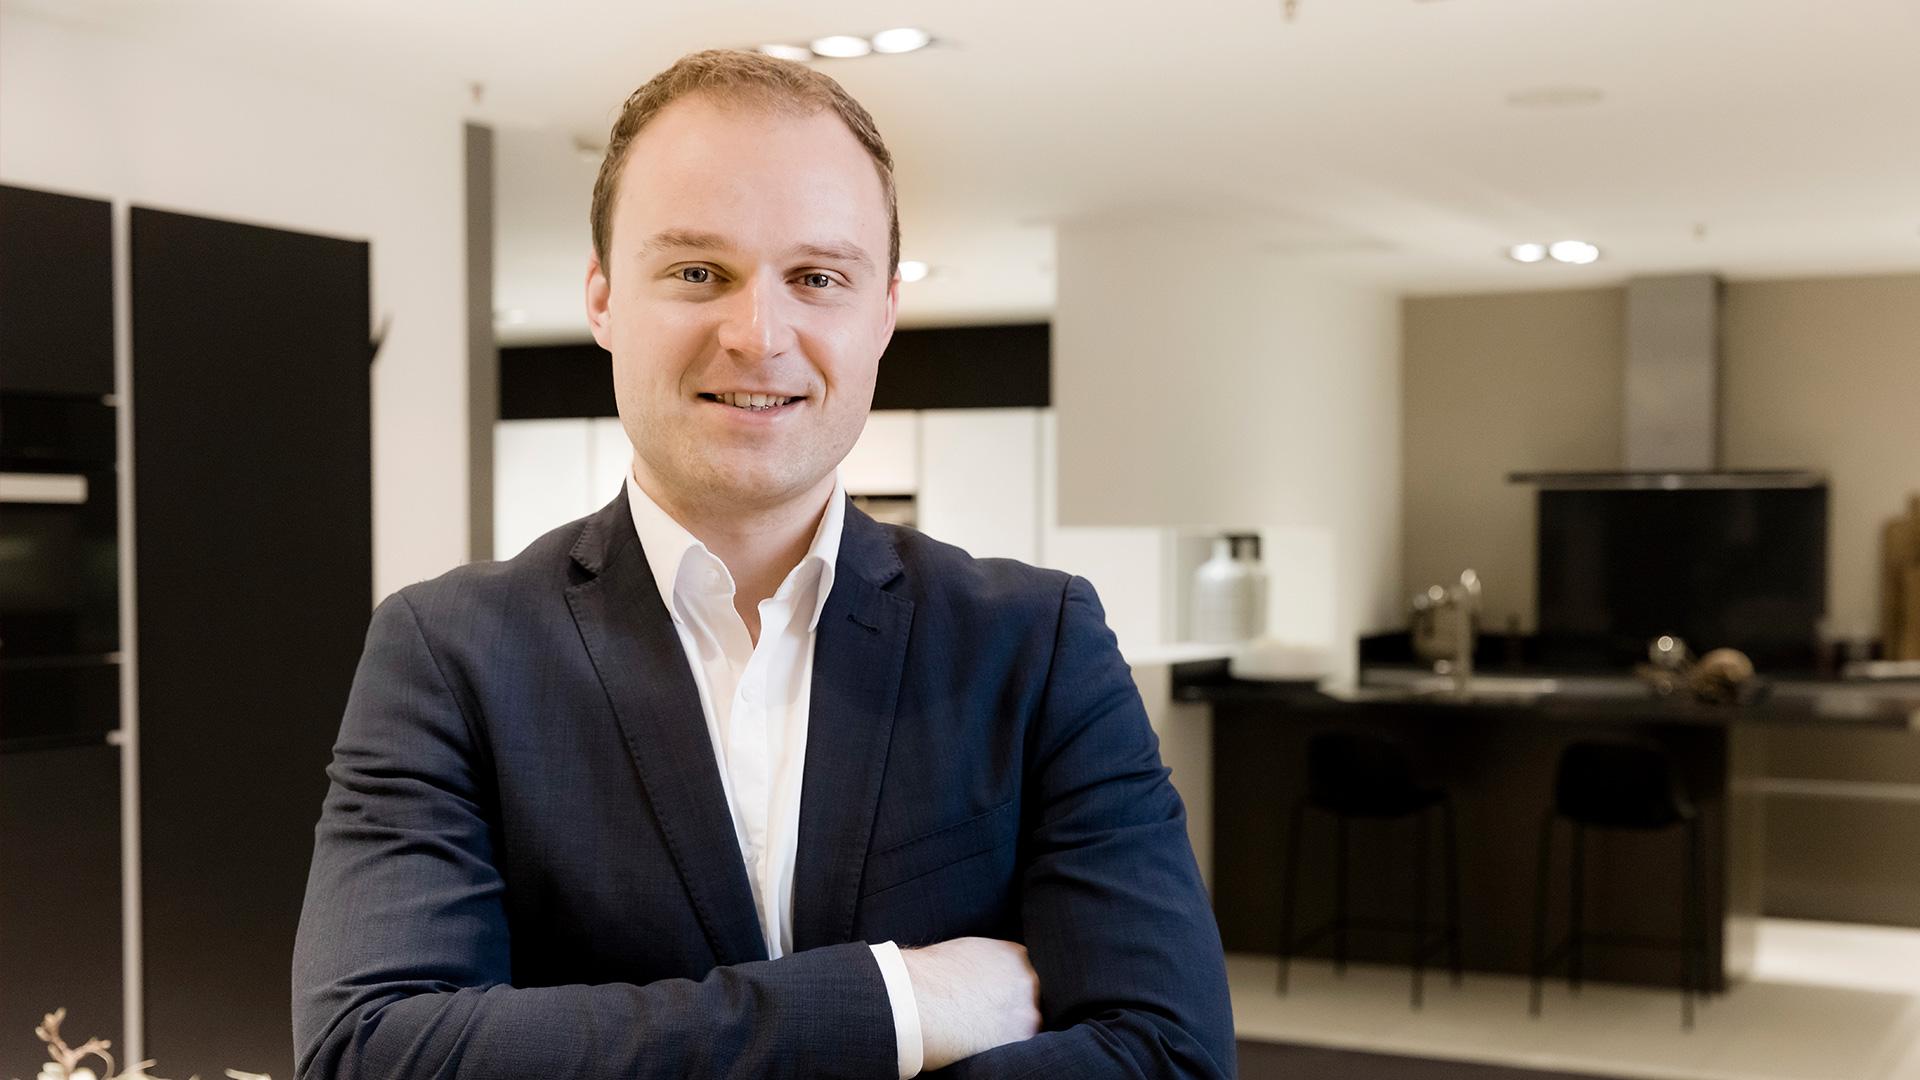 Dirk Jan Loeters - Accountmanager